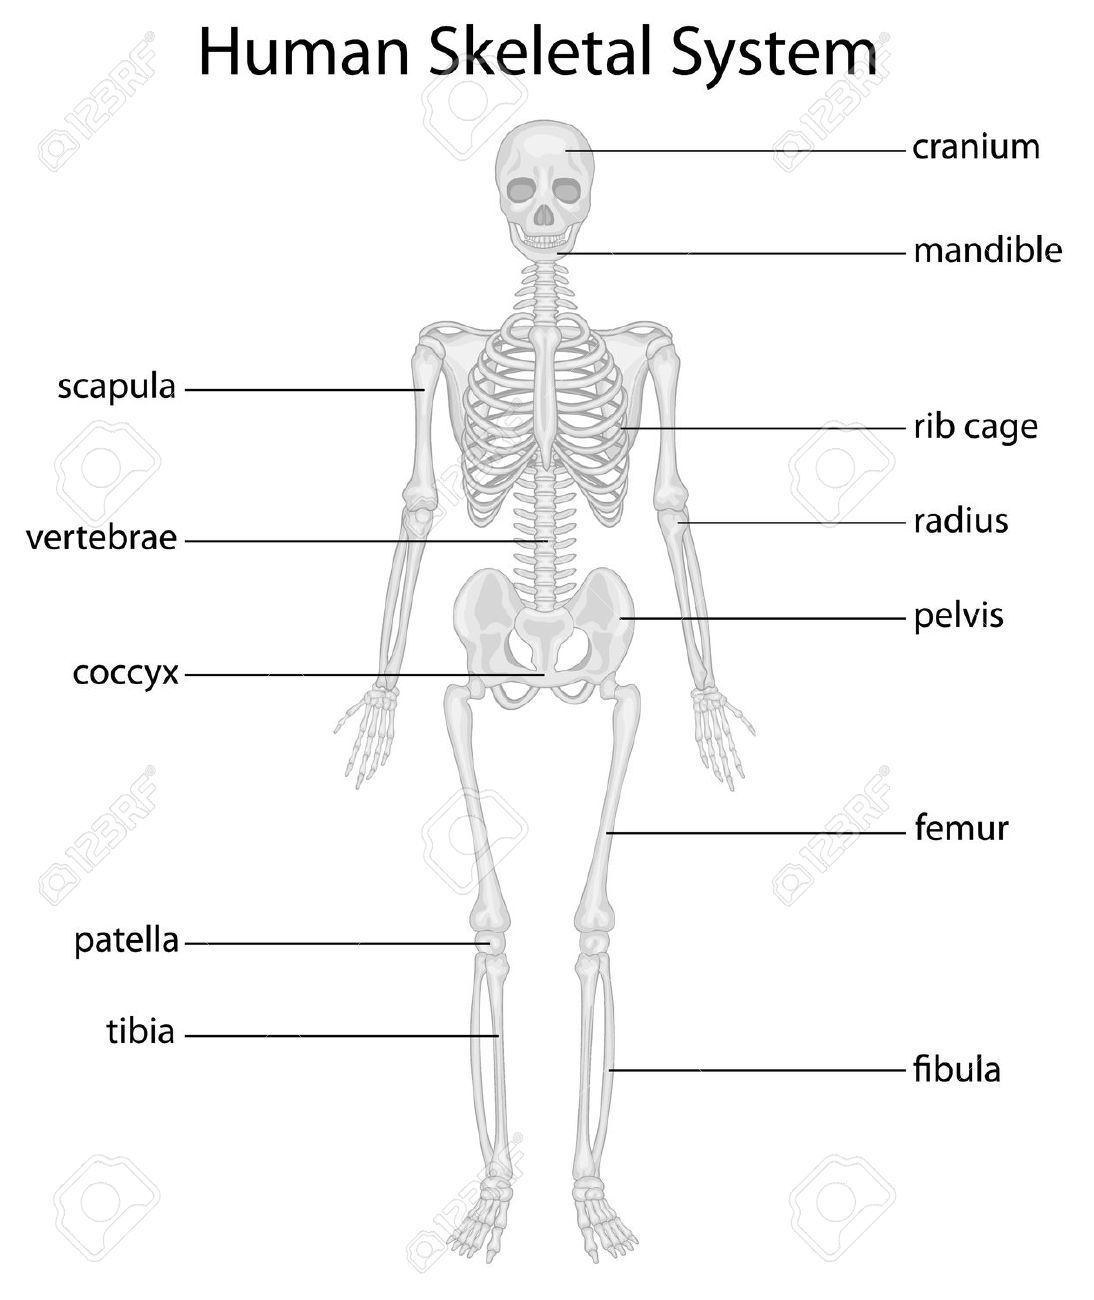 hight resolution of body skeleton diagram without labels skeletal system diagram without labels label long bone diagram